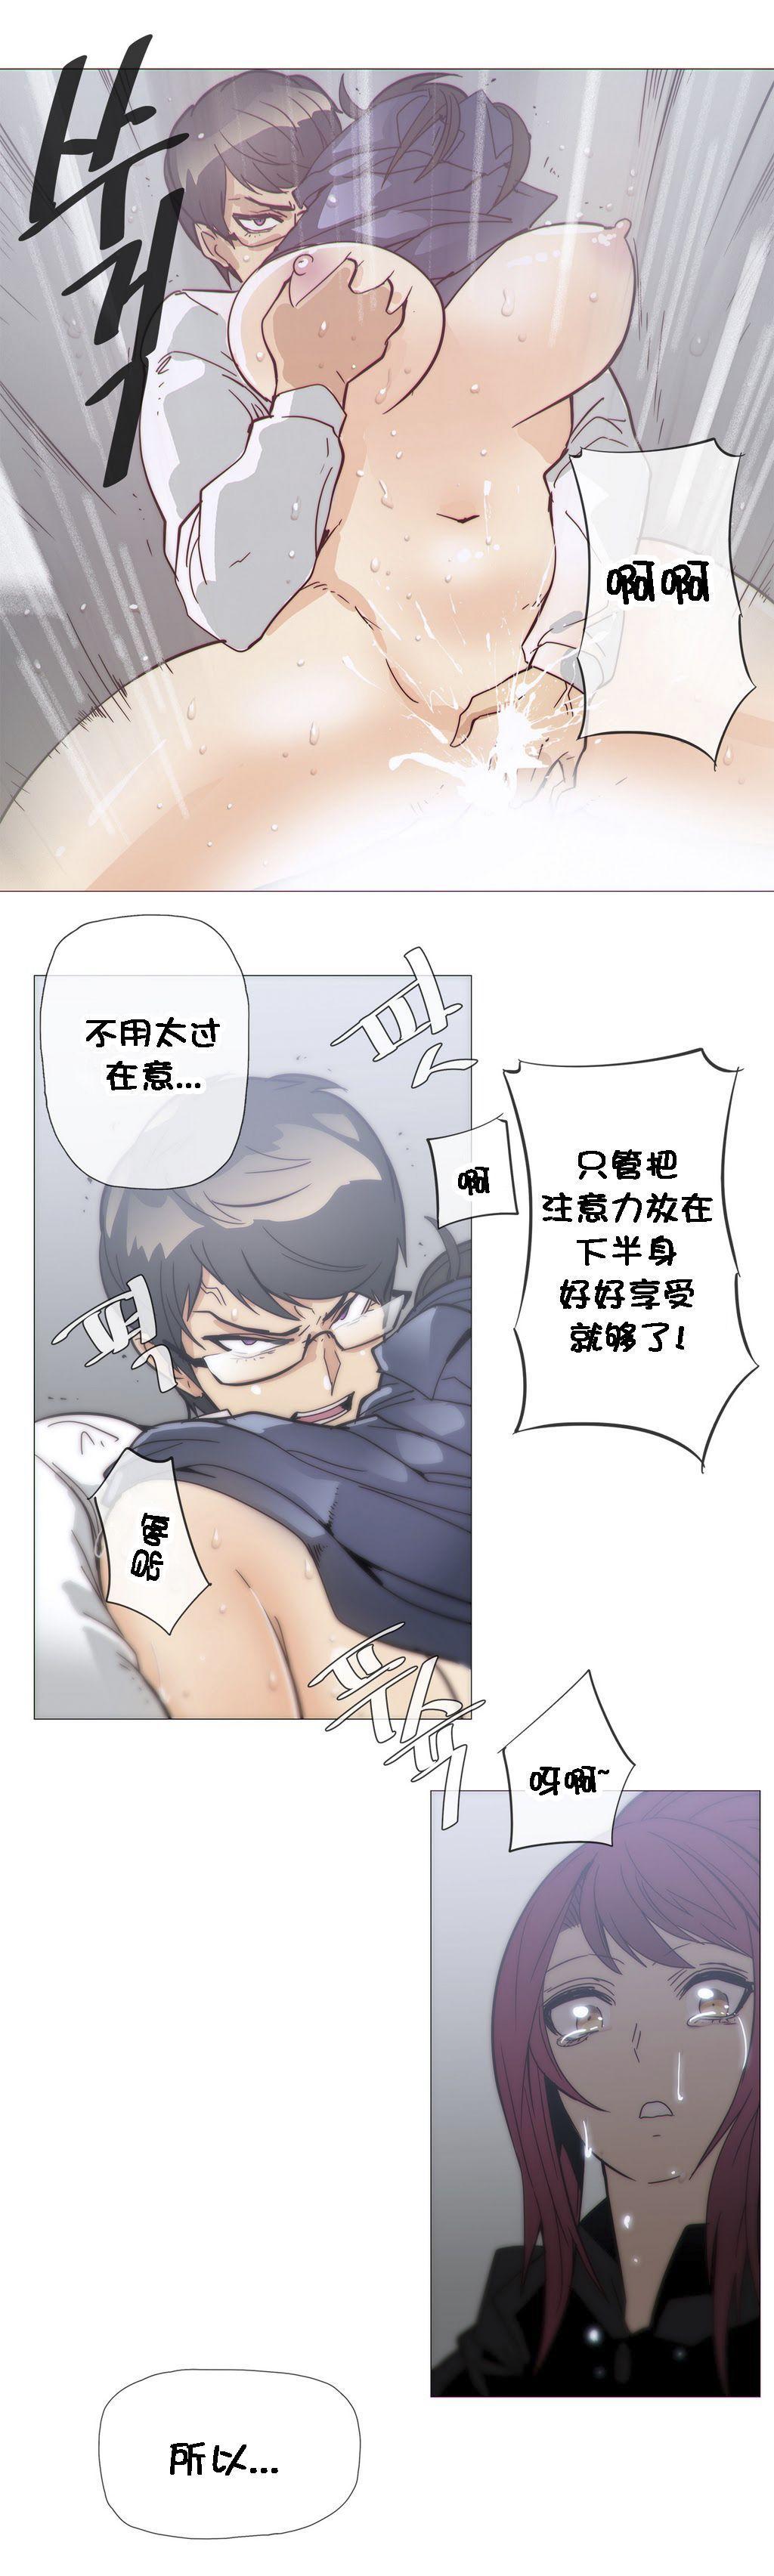 HouseHold Affairs 【卞赤鲤个人汉化】1~33话(持续更新中) 715